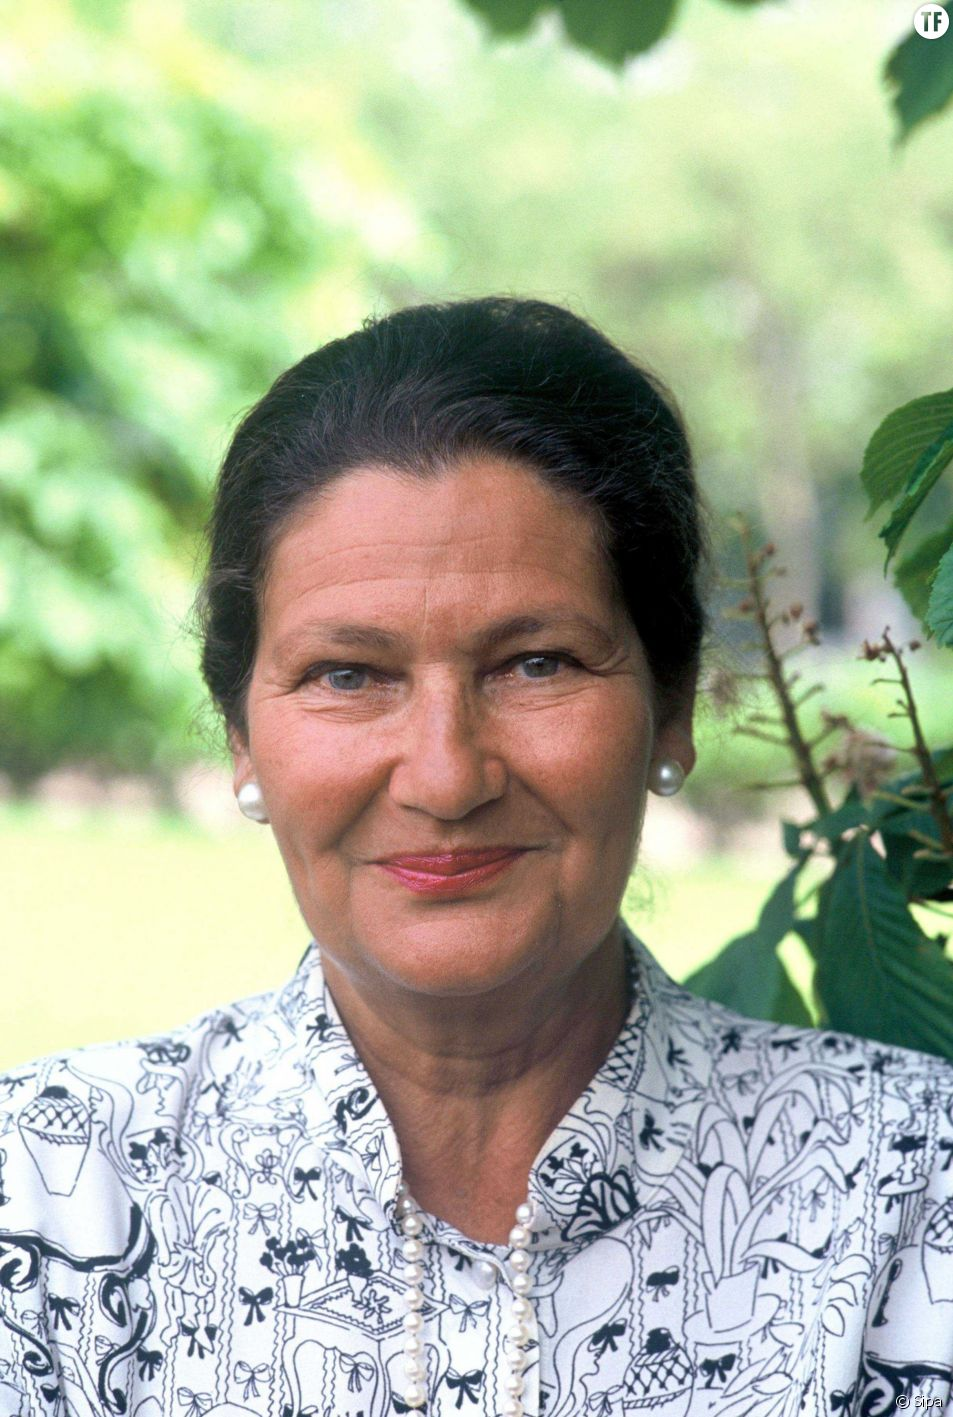 Simone Veil en 1989.